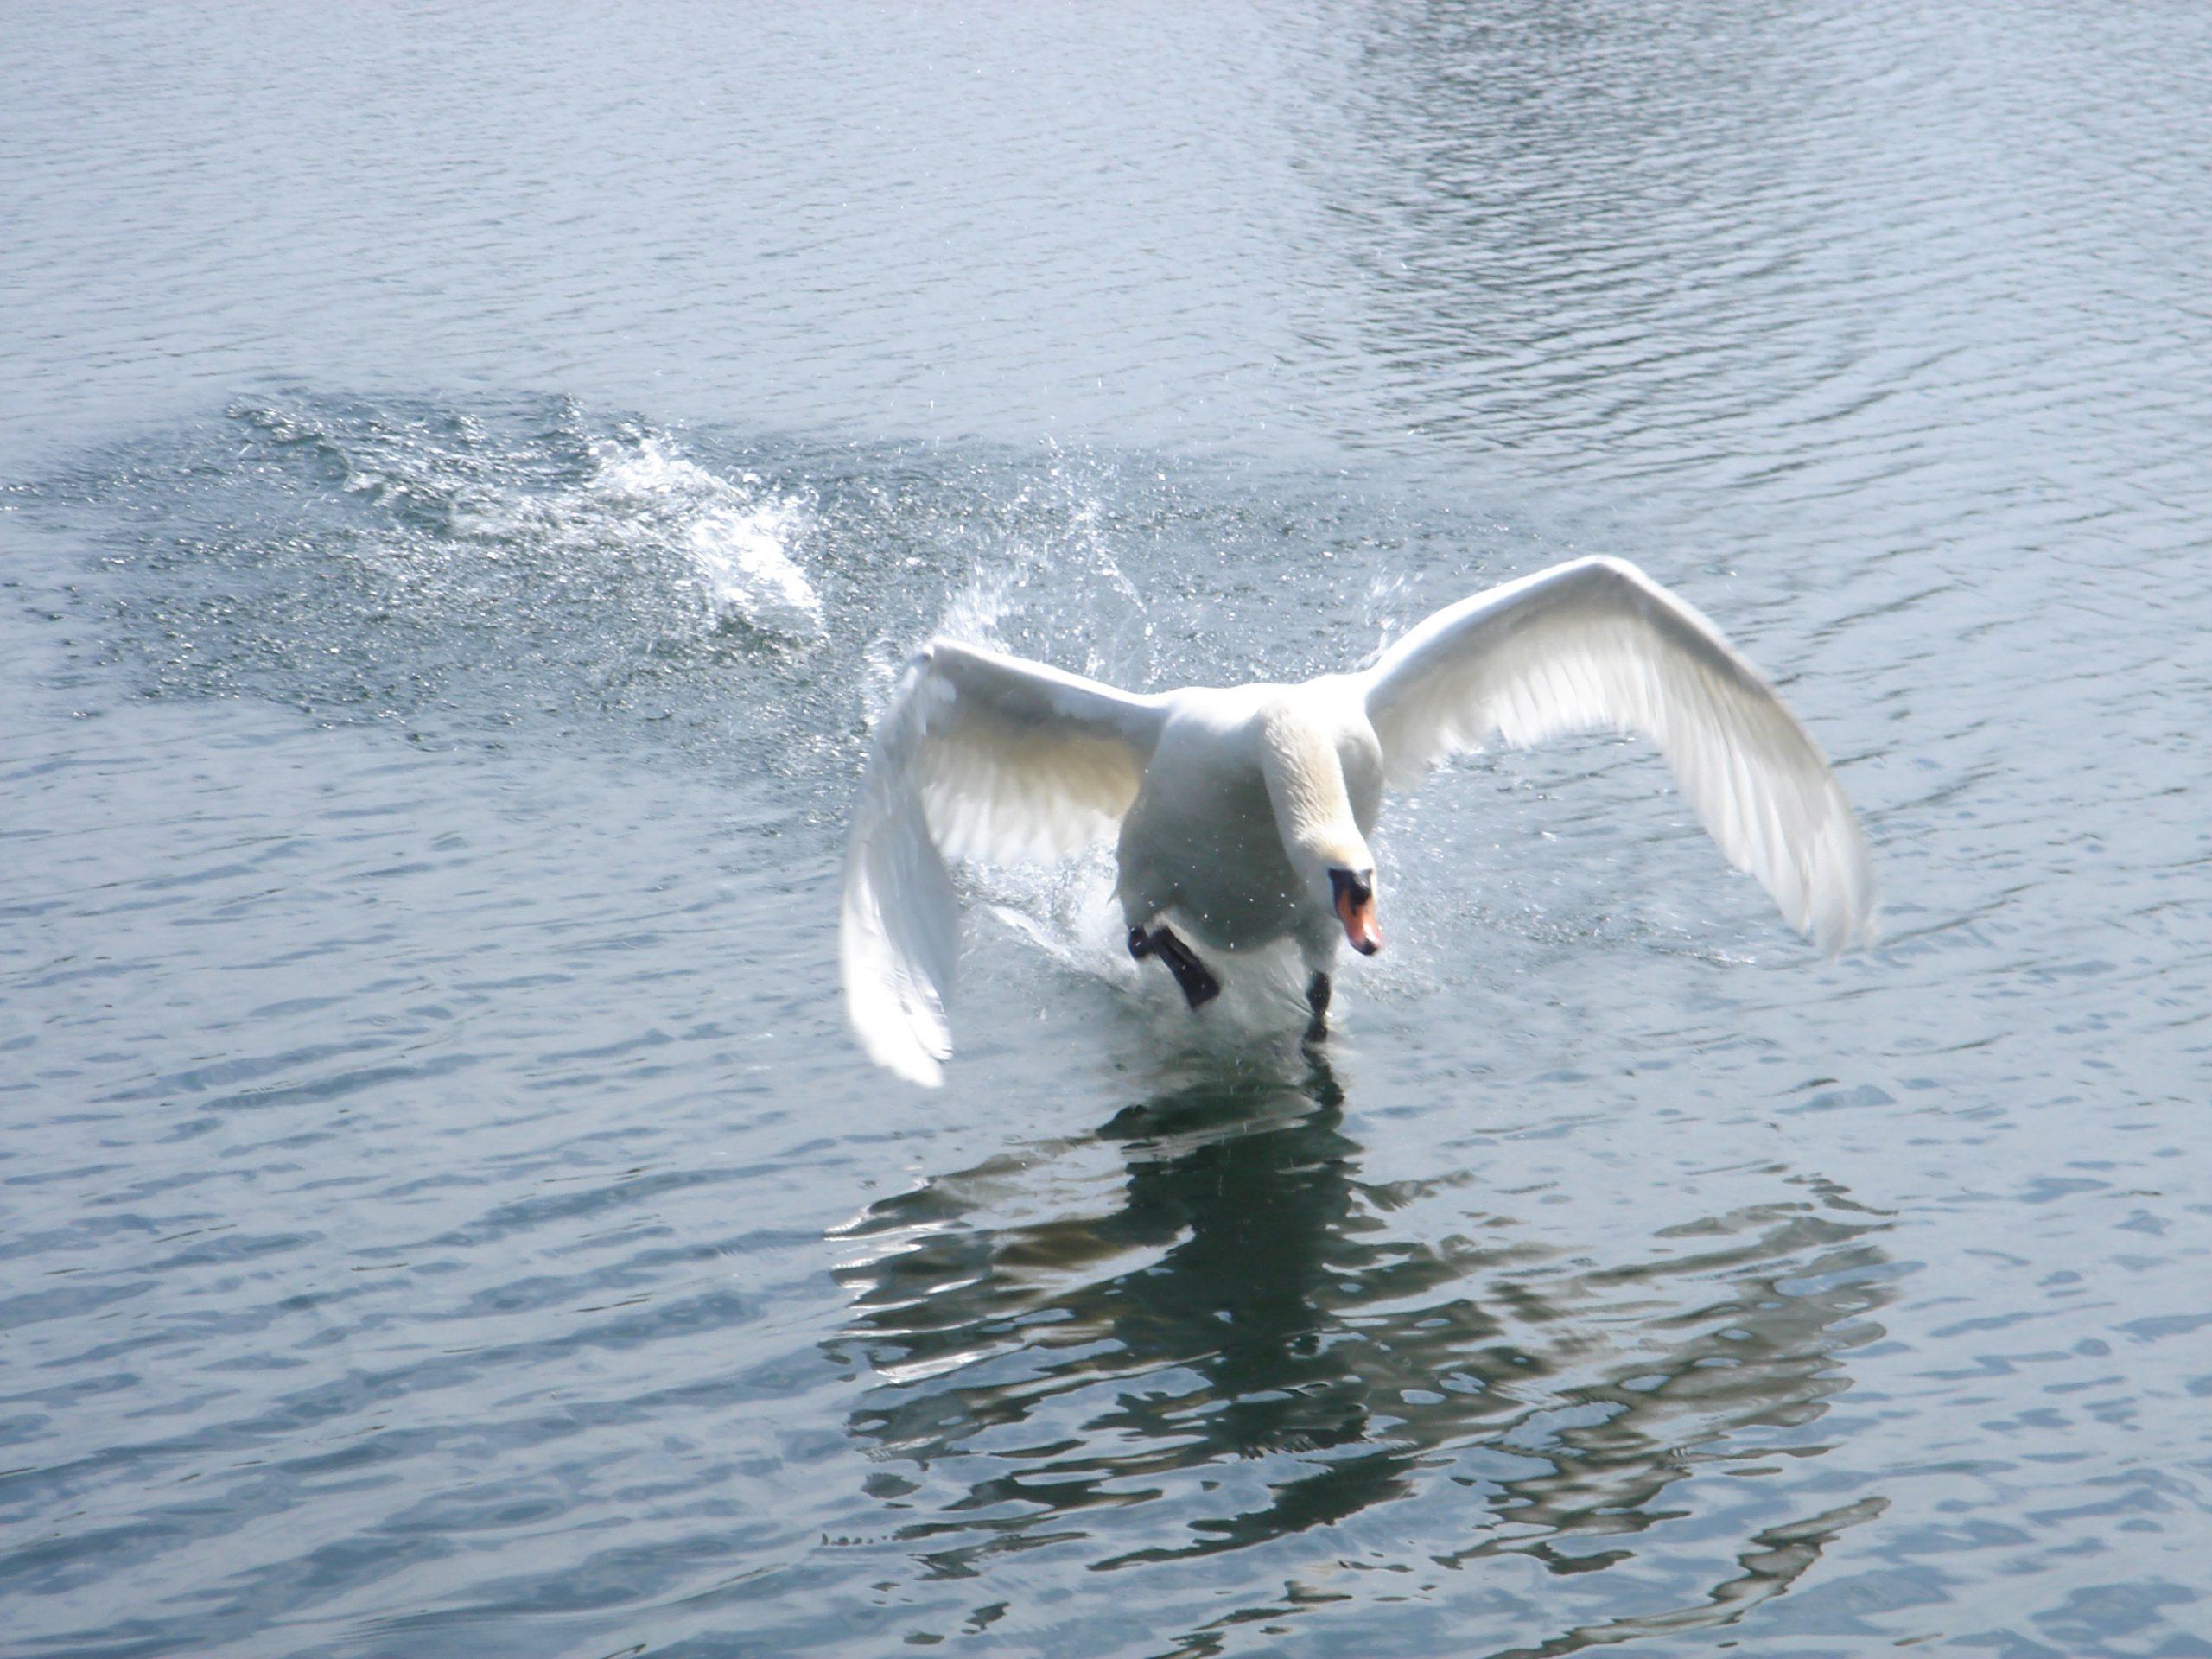 Swan Lift-off